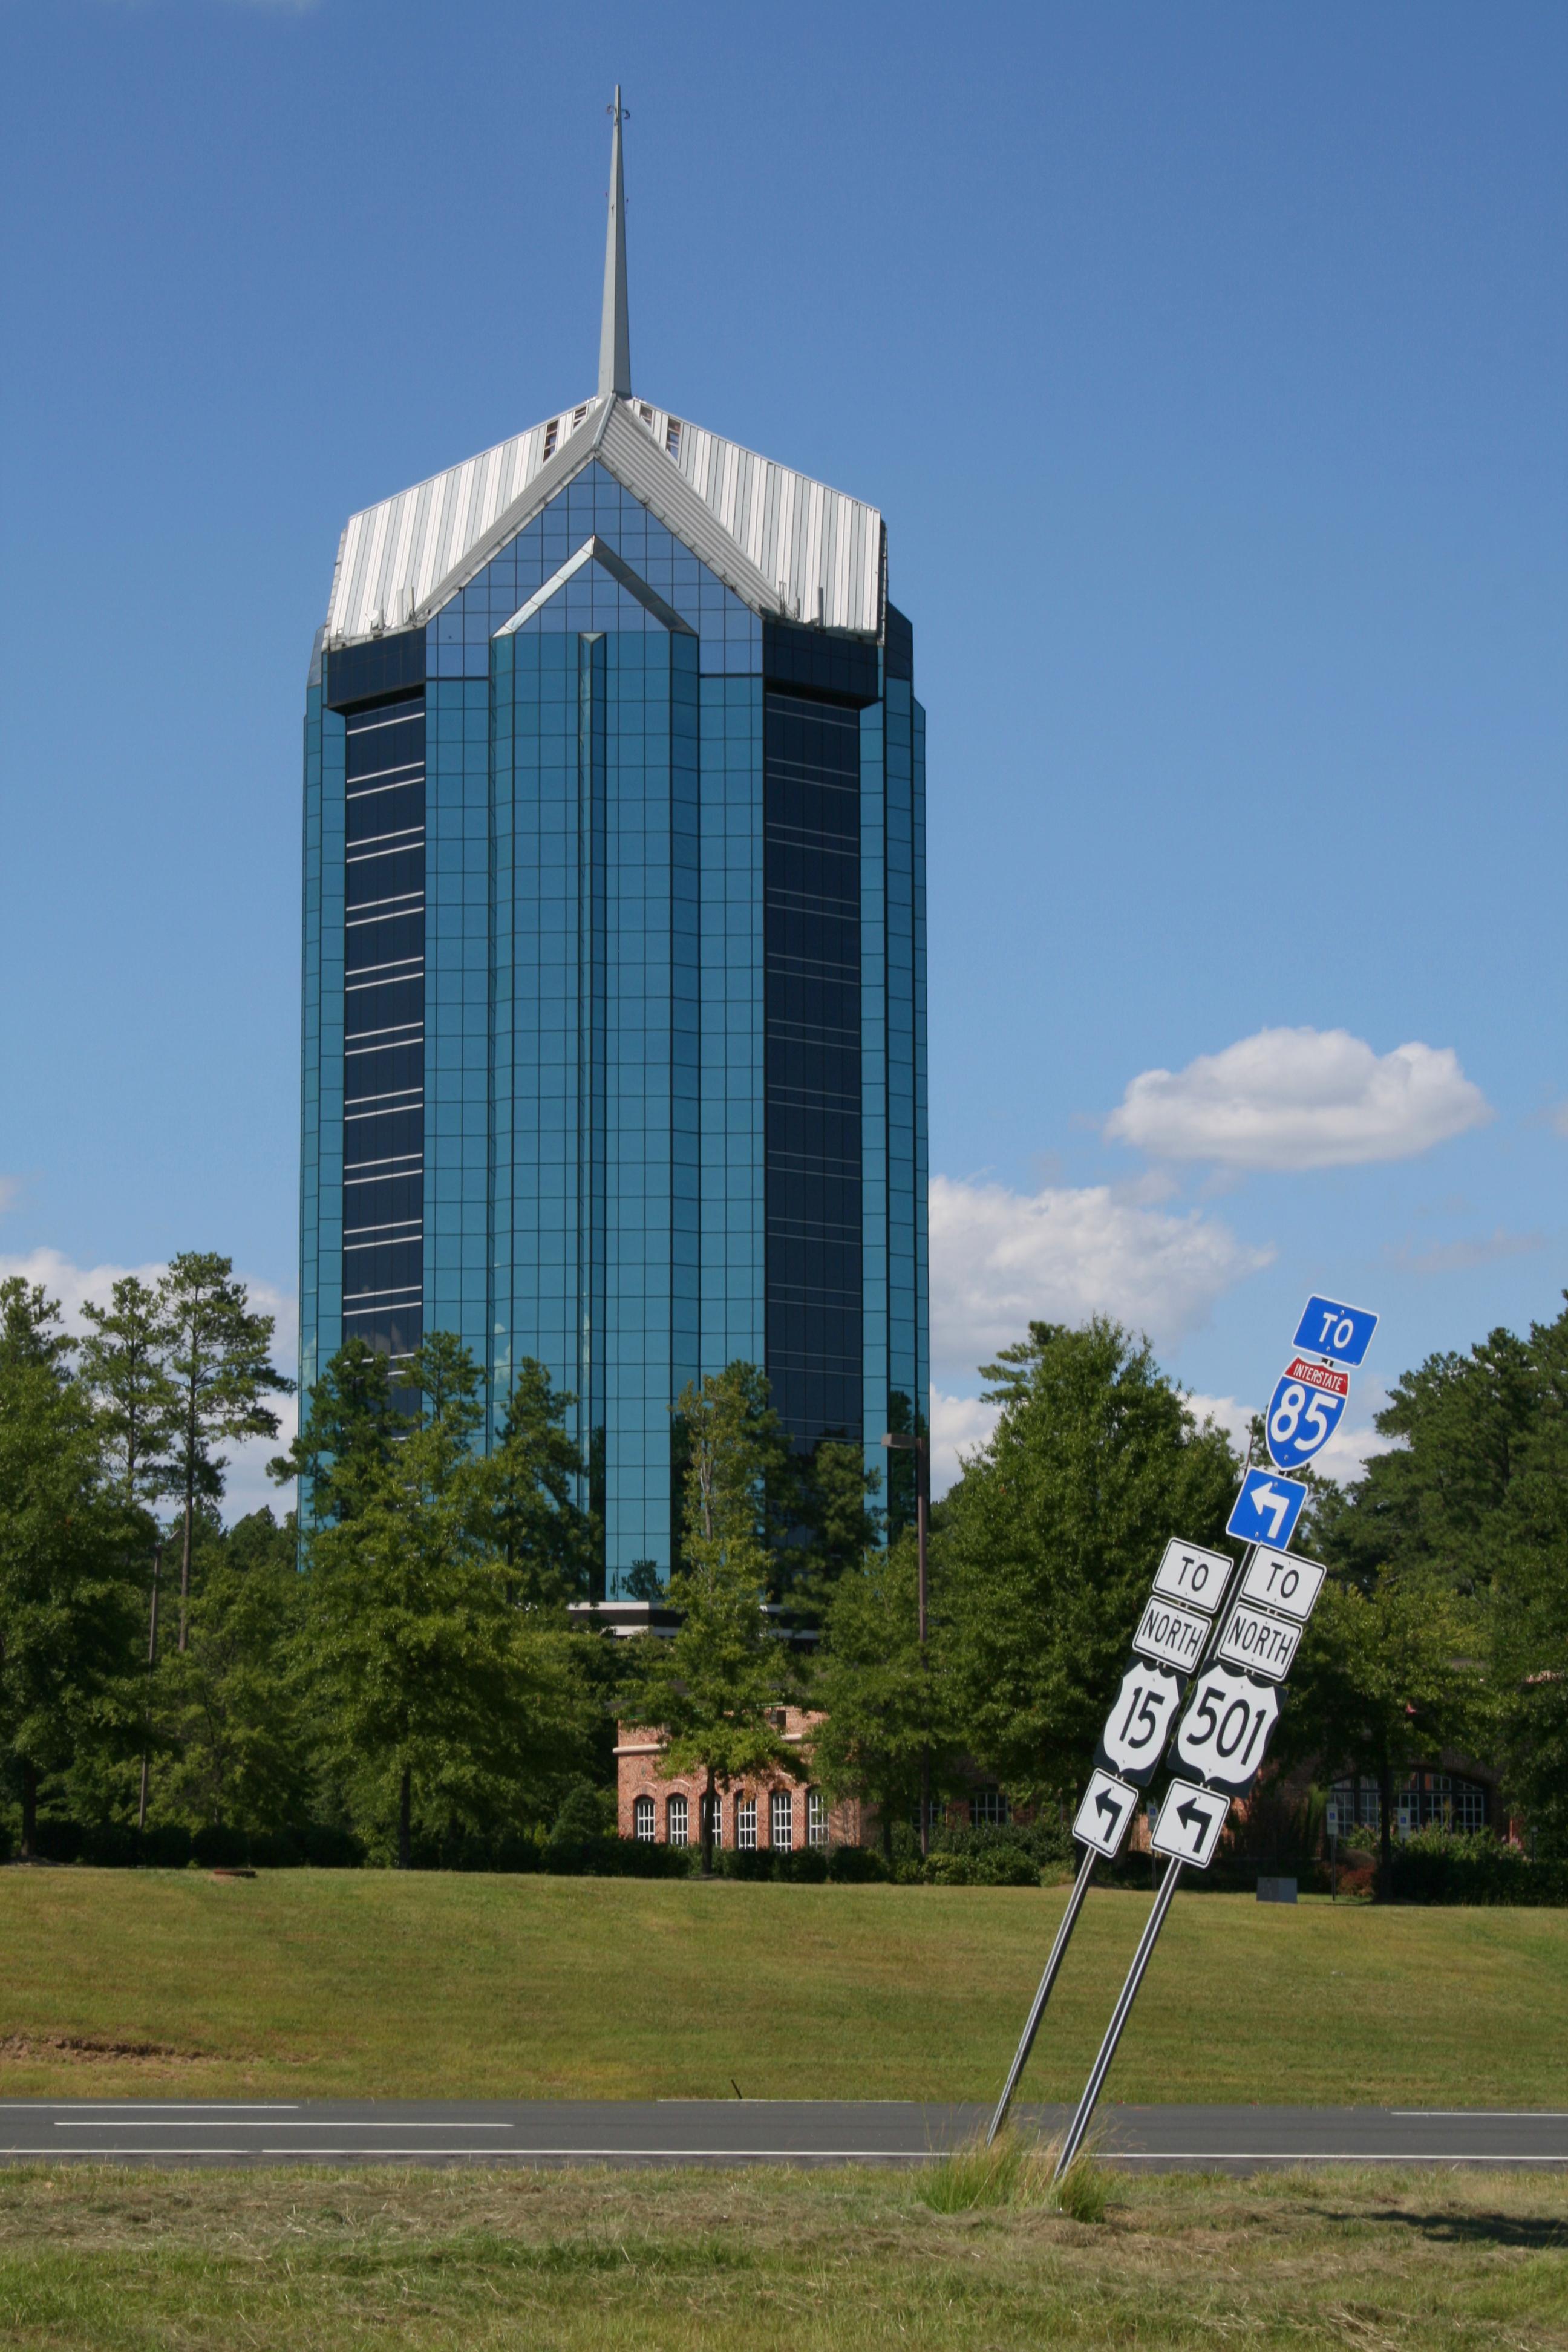 File 2008-08-11 University Tower across Durham-Chapel Hill Blvd.jpg ... b88ec177b6104